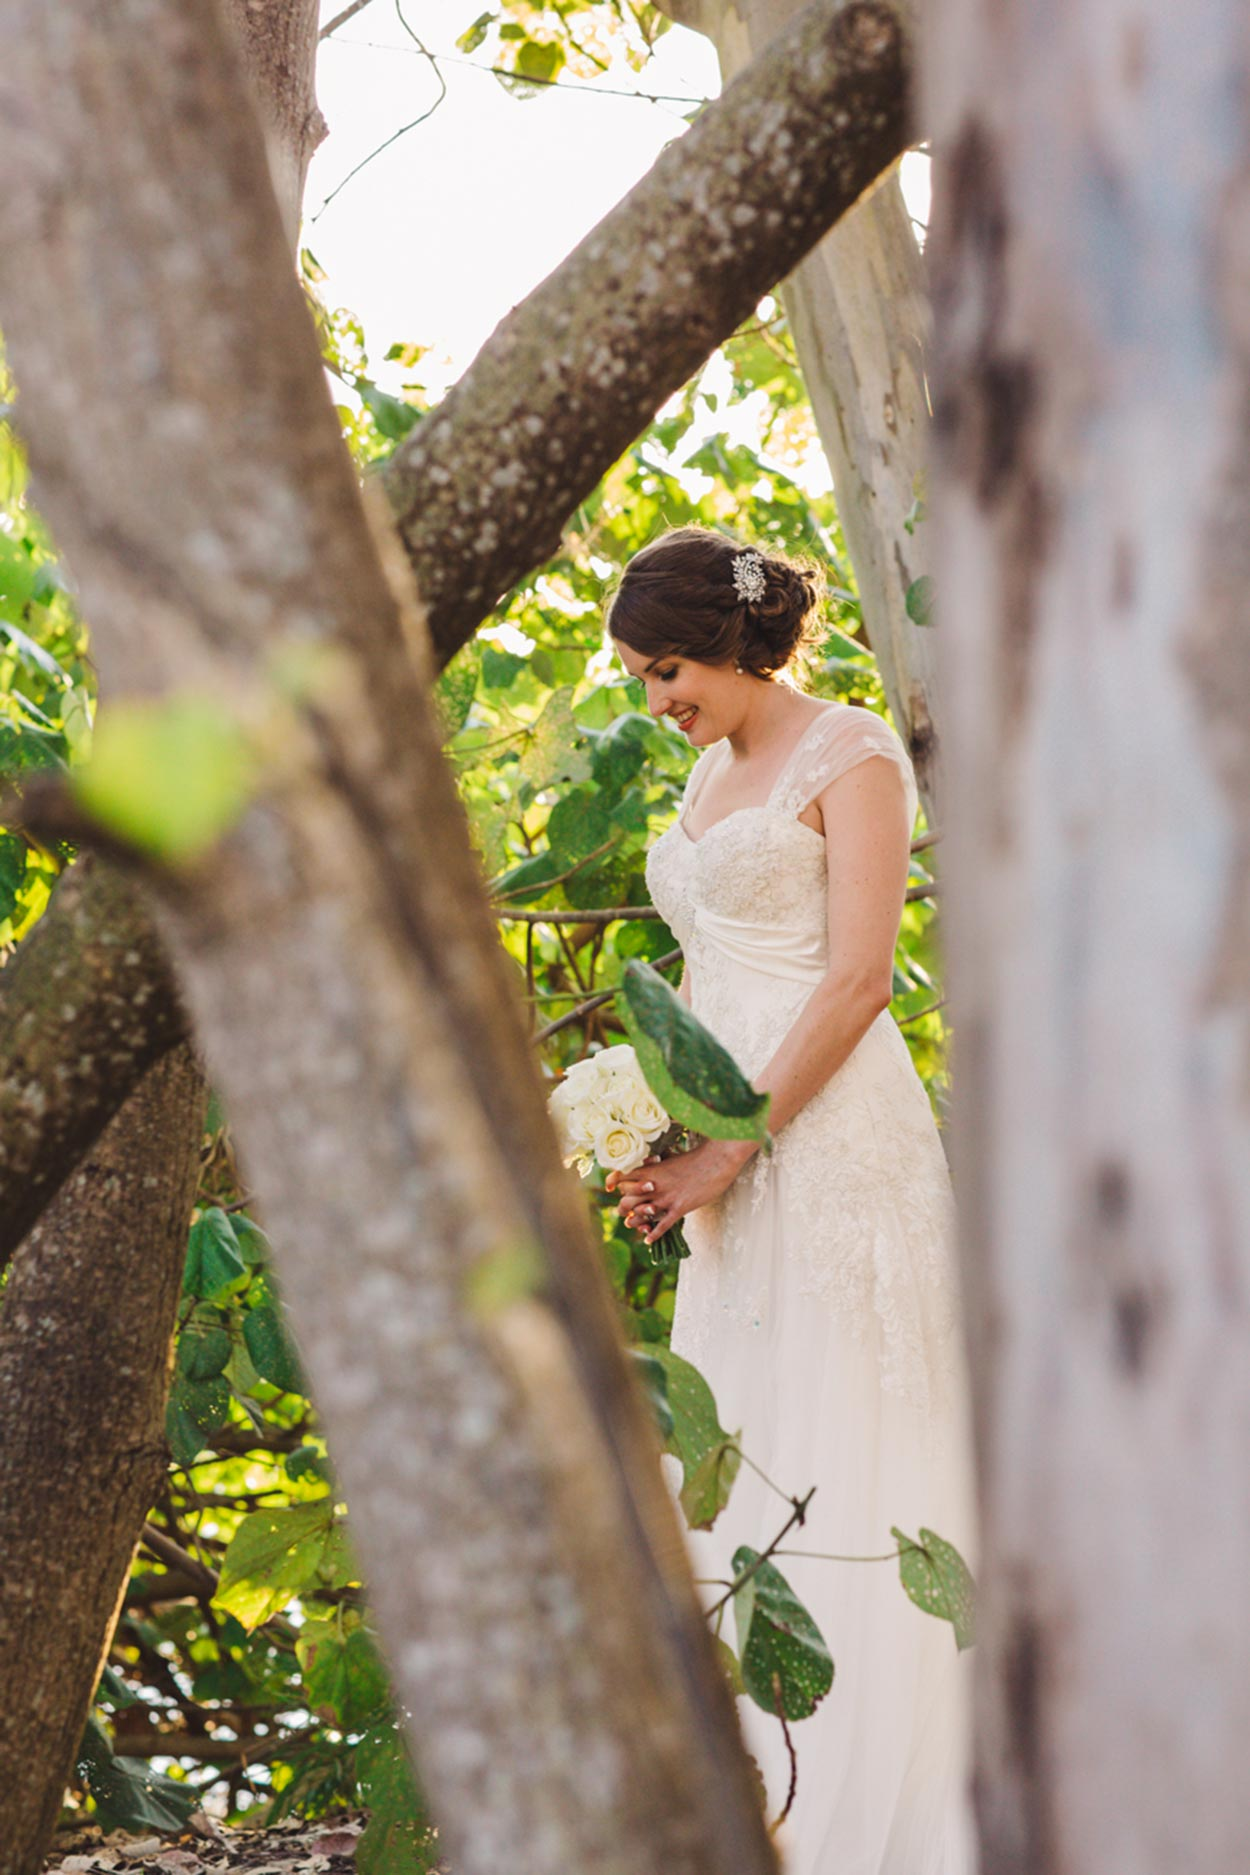 Sunshine-Coast-Wedding-Photographers-Eco-Friendly-Noosa-Maleny-Montville-Mapleton-Flaxton-Hinterland-Mooloolaba-Maroochydore-Caloundra-Coolum-Beach-Elopement-Brisbane-World-Best-Top-134.jpg